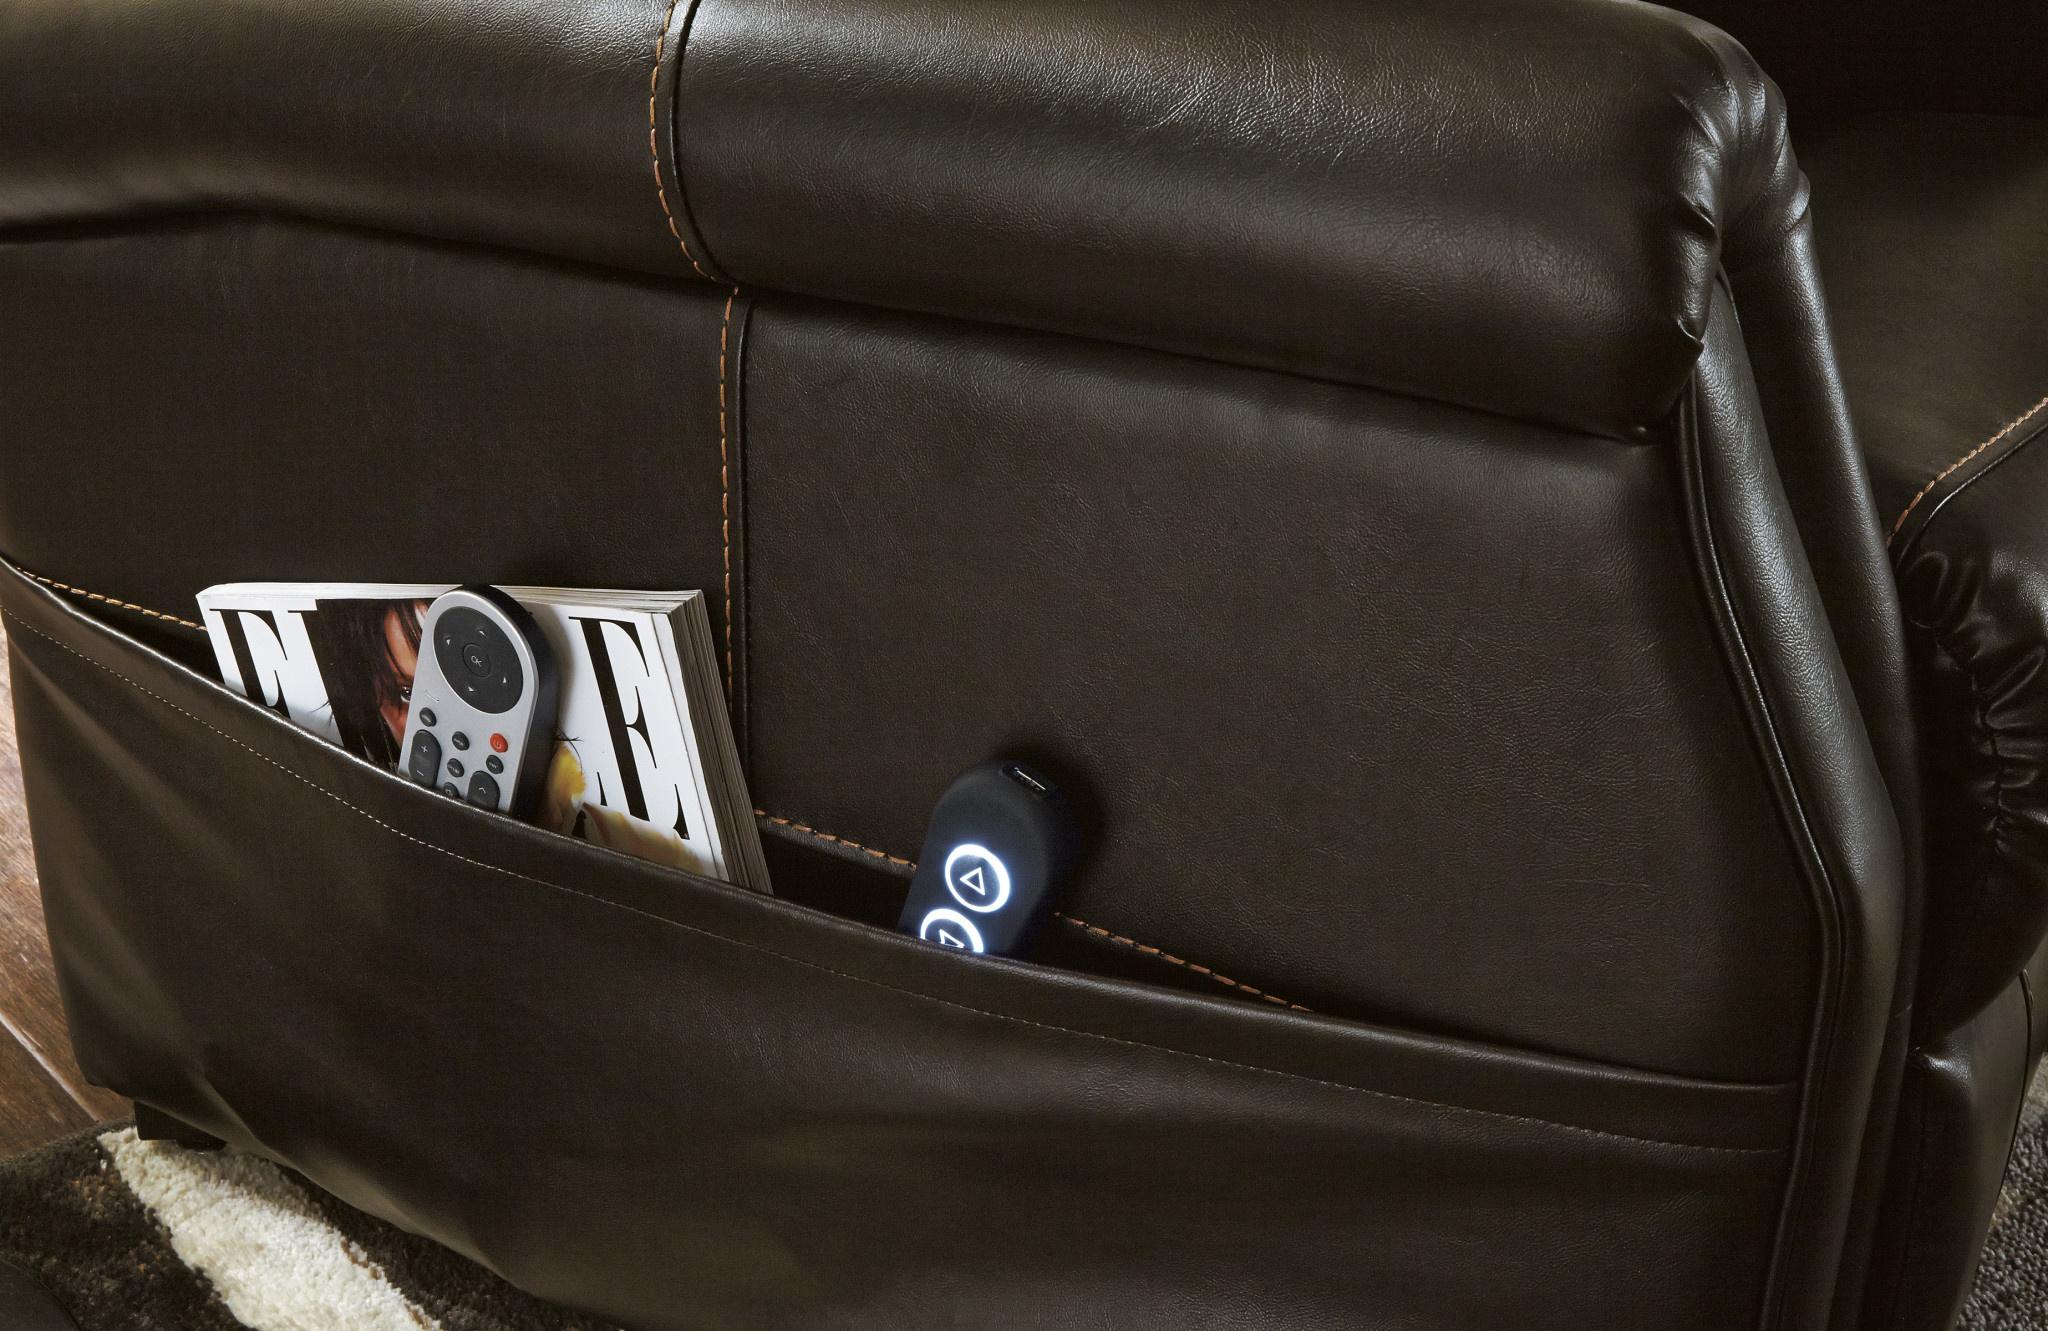 Signature Design Power Lift Recliner- Markridge- Chocolate